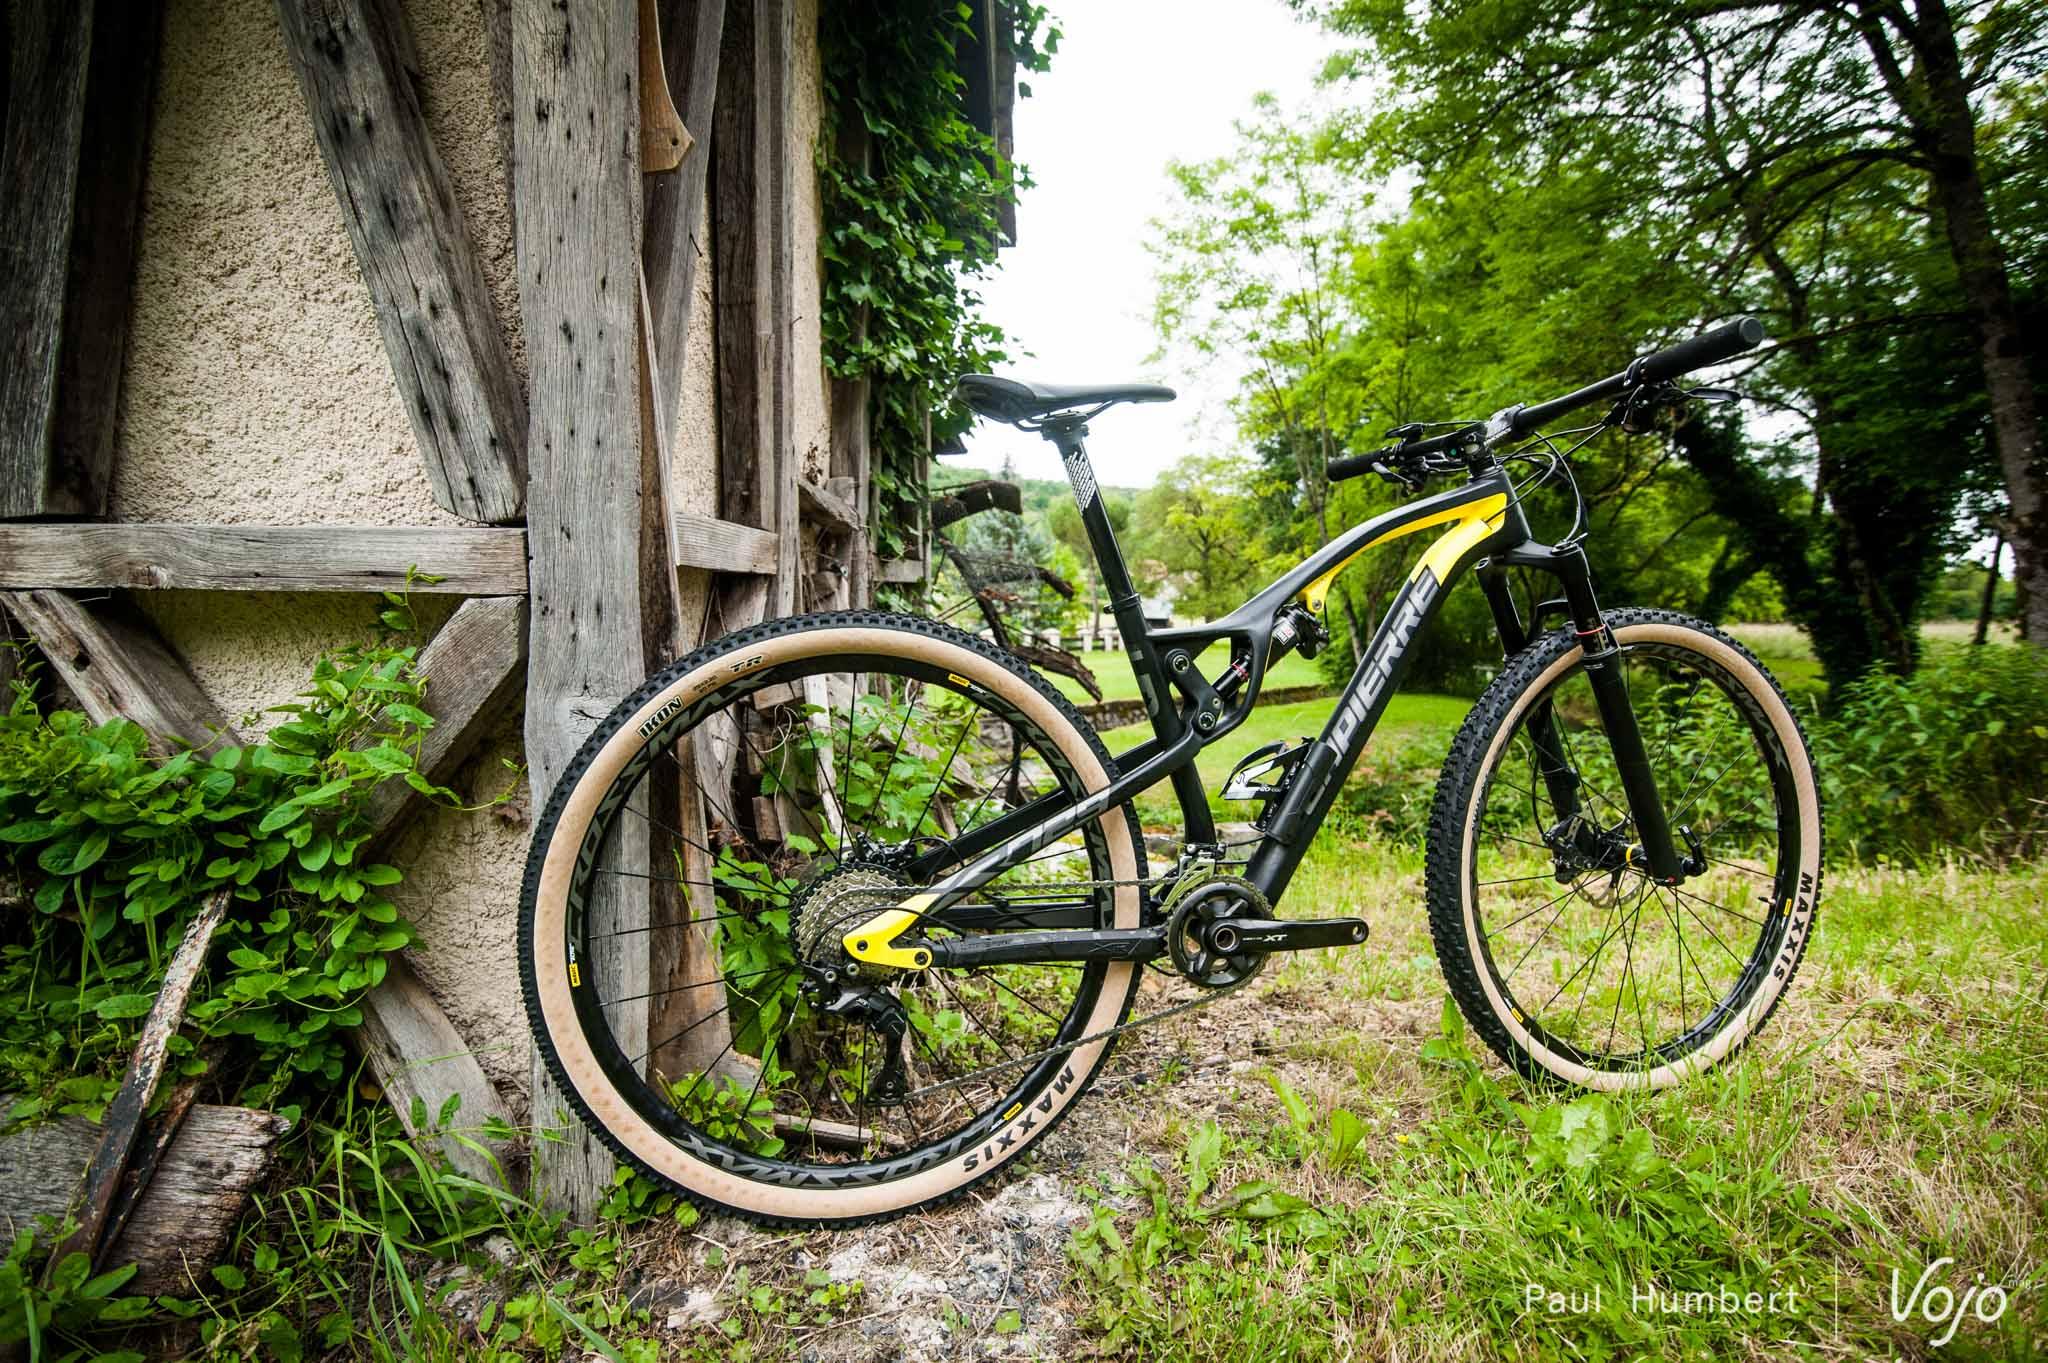 Lapierre-XM-carbone-vojo-2016-paul-humbert-6